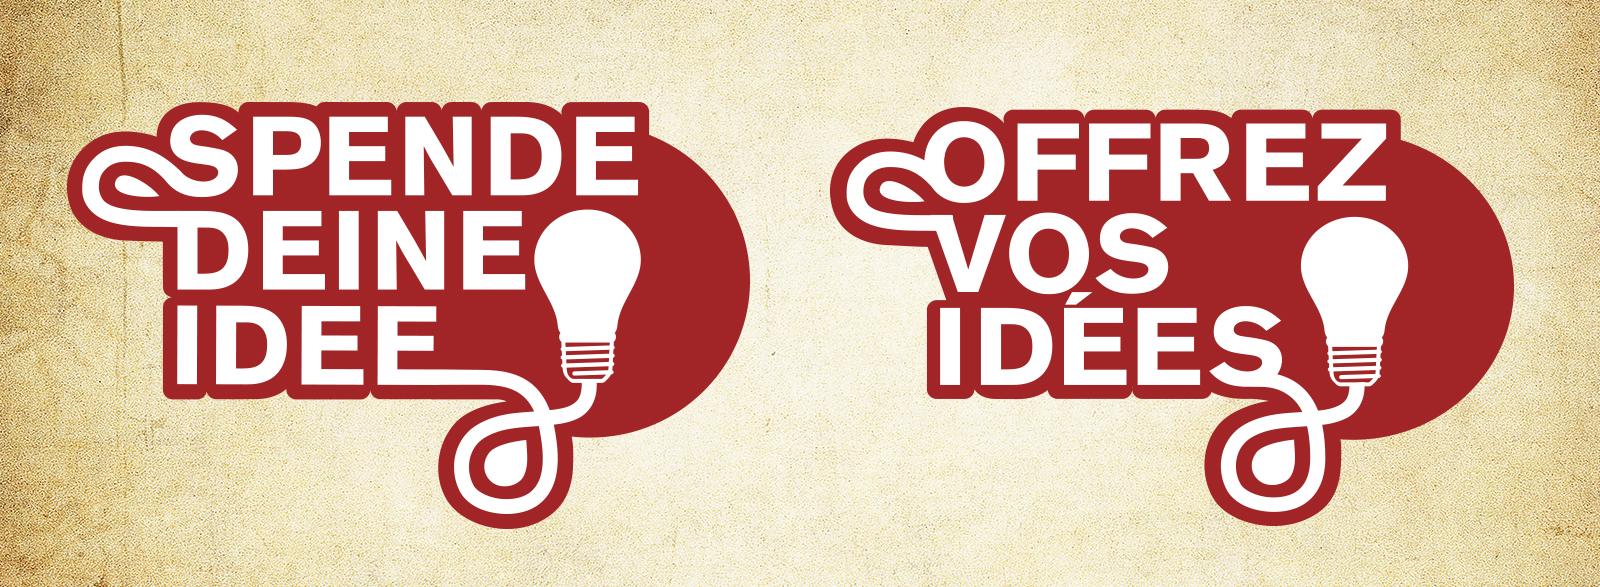 Logos_Spende_Deine_Idee_2